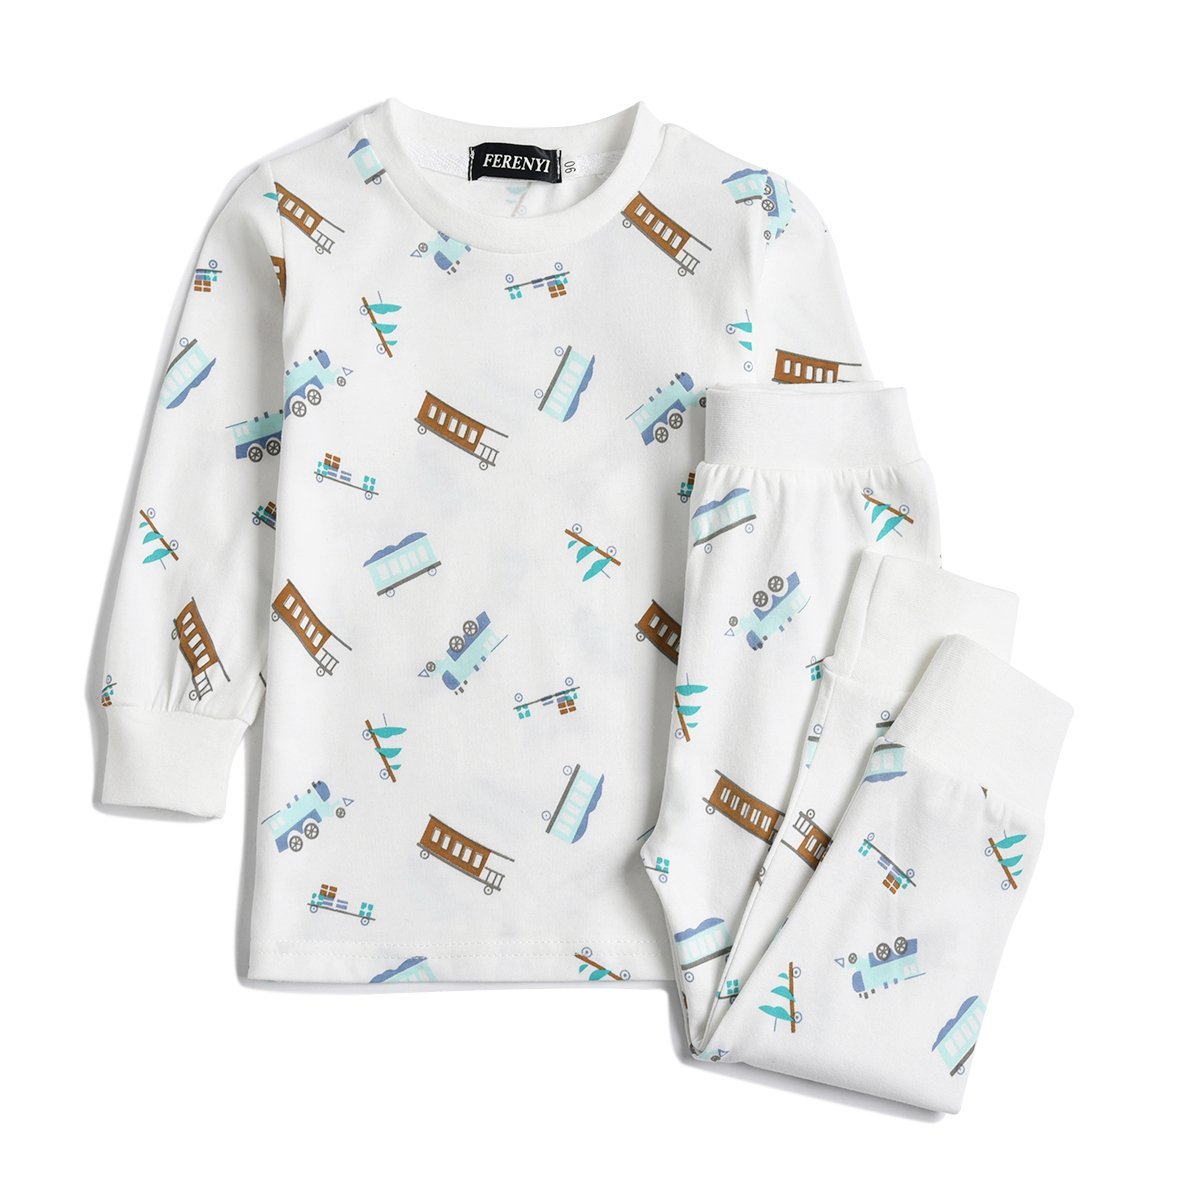 FERENYI Children Pajamas Cotton Kids Clothes Toddler Sleepwear Clothes T Shirt Pants Set For Kids (White, 3T)